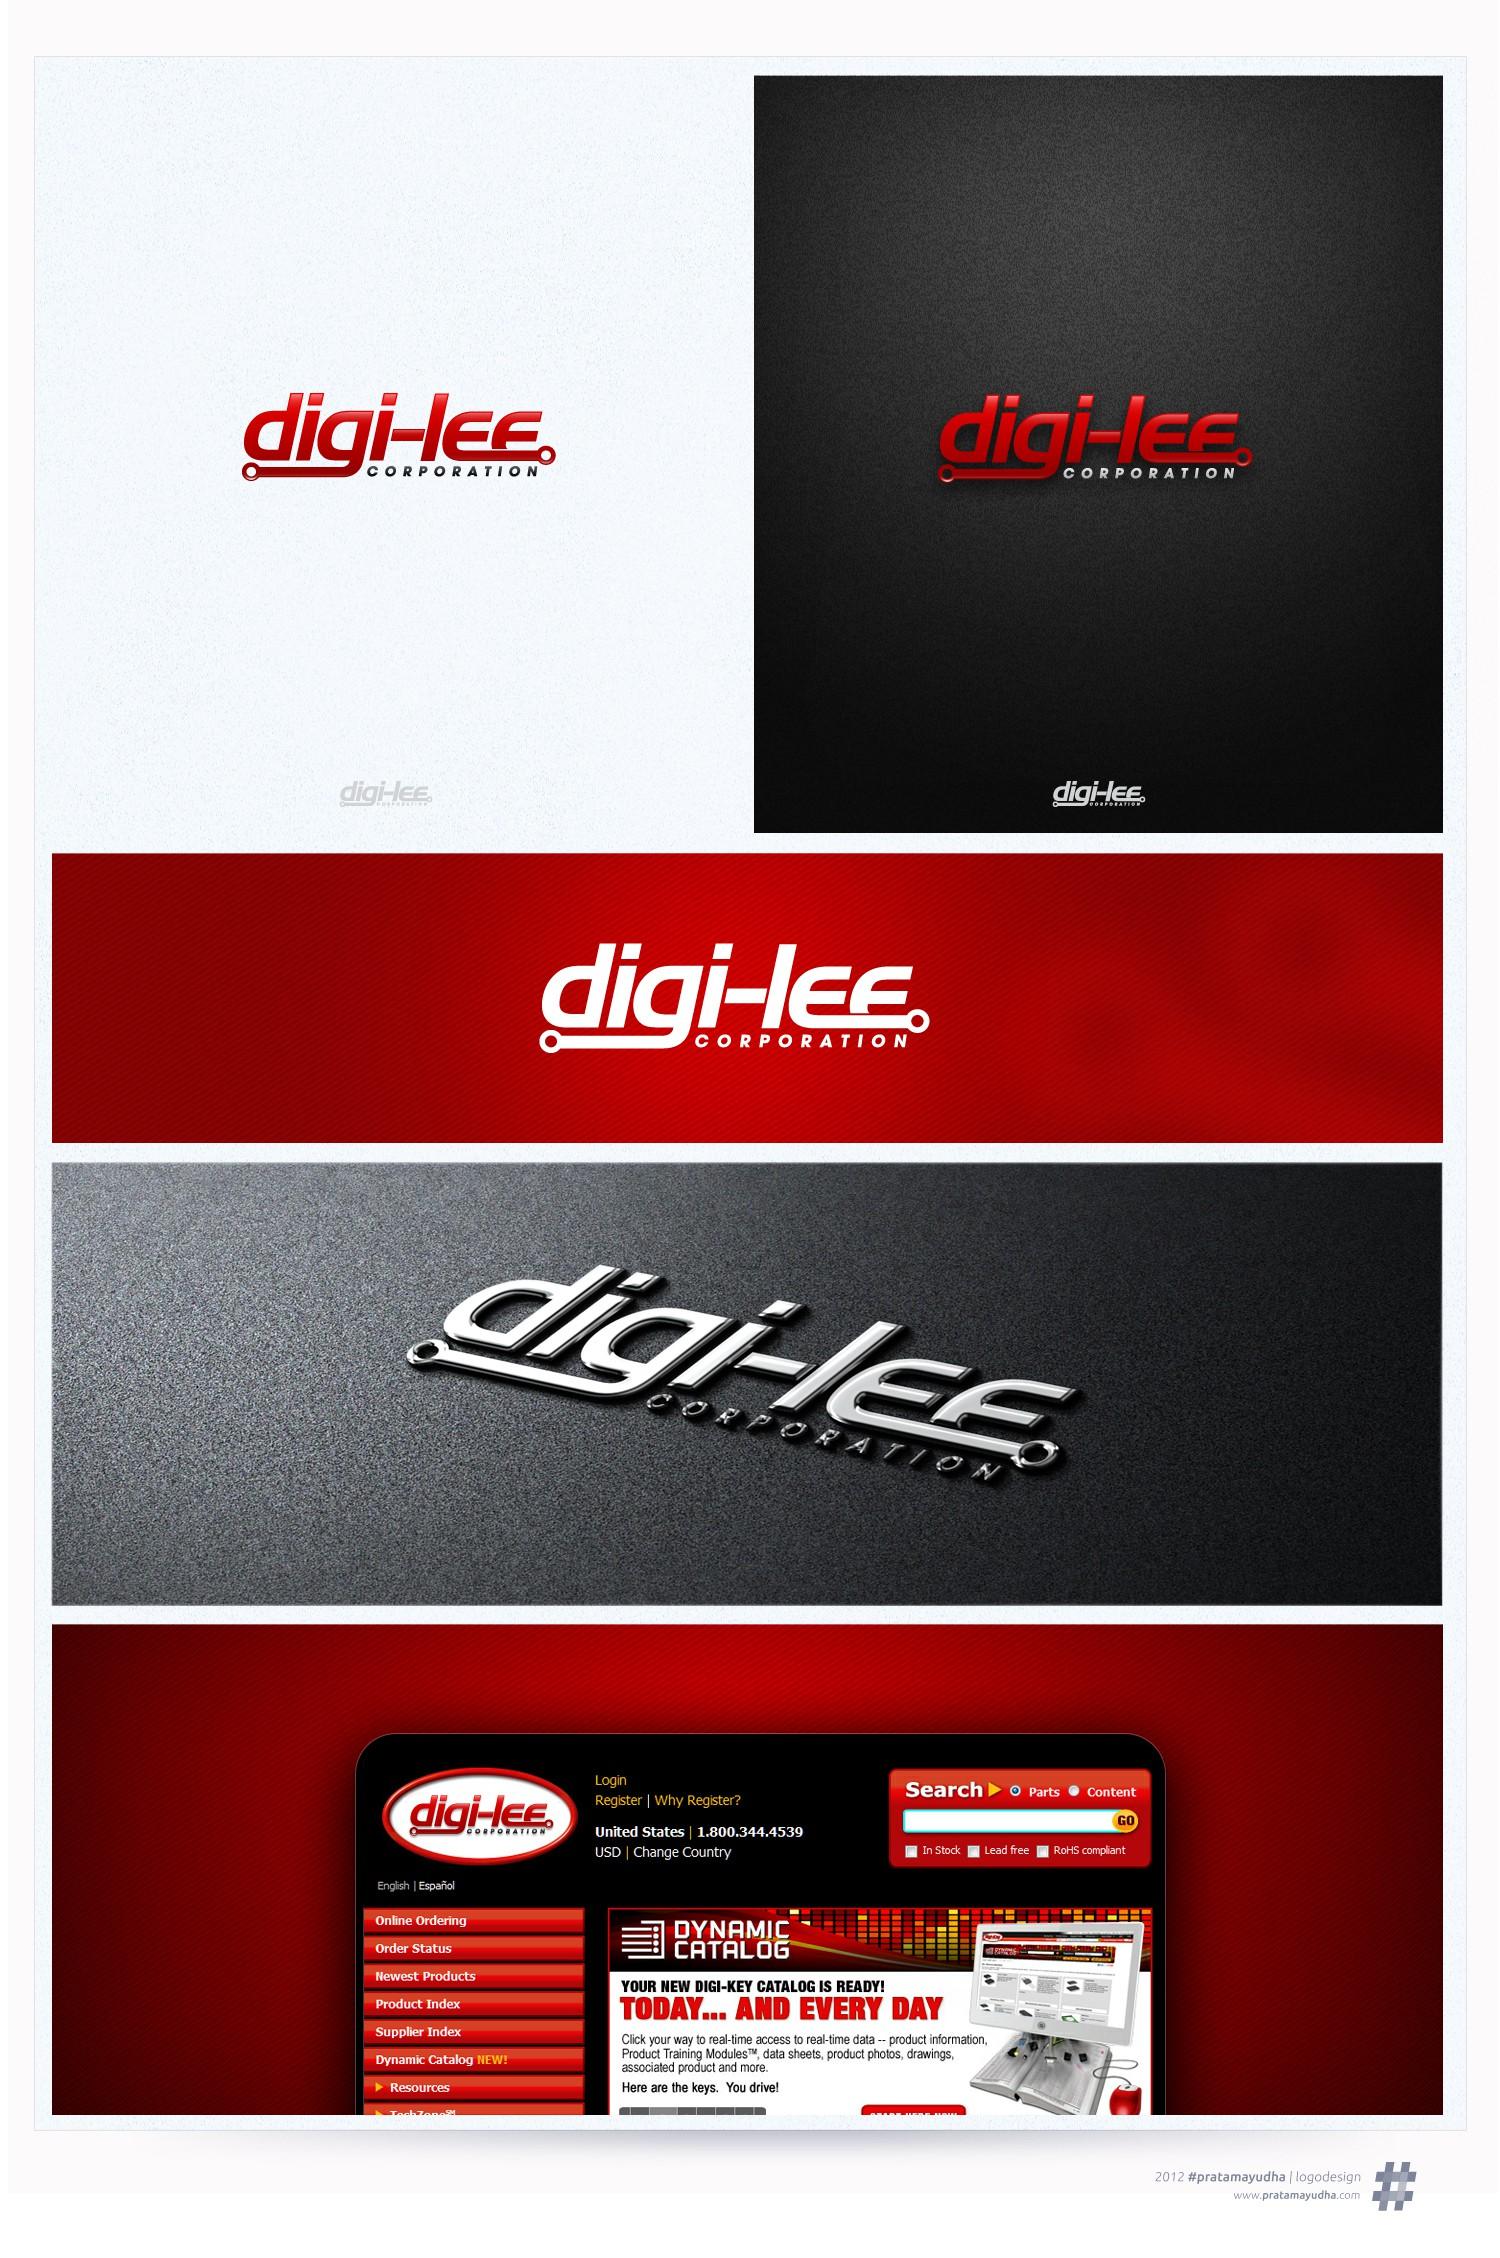 Help Digi-Key Corporation with a new logo